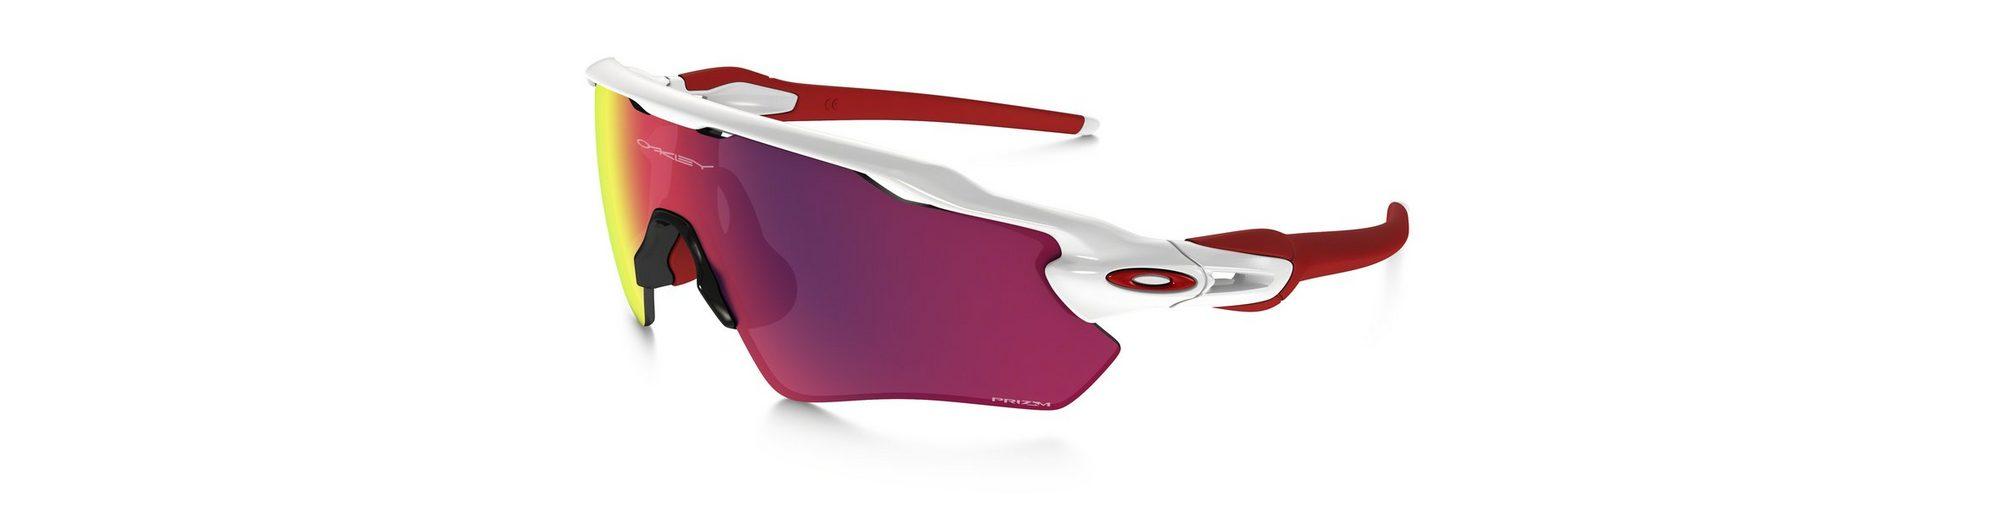 Oakley Radsportbrille »Prizm Radar EV Path Brille«